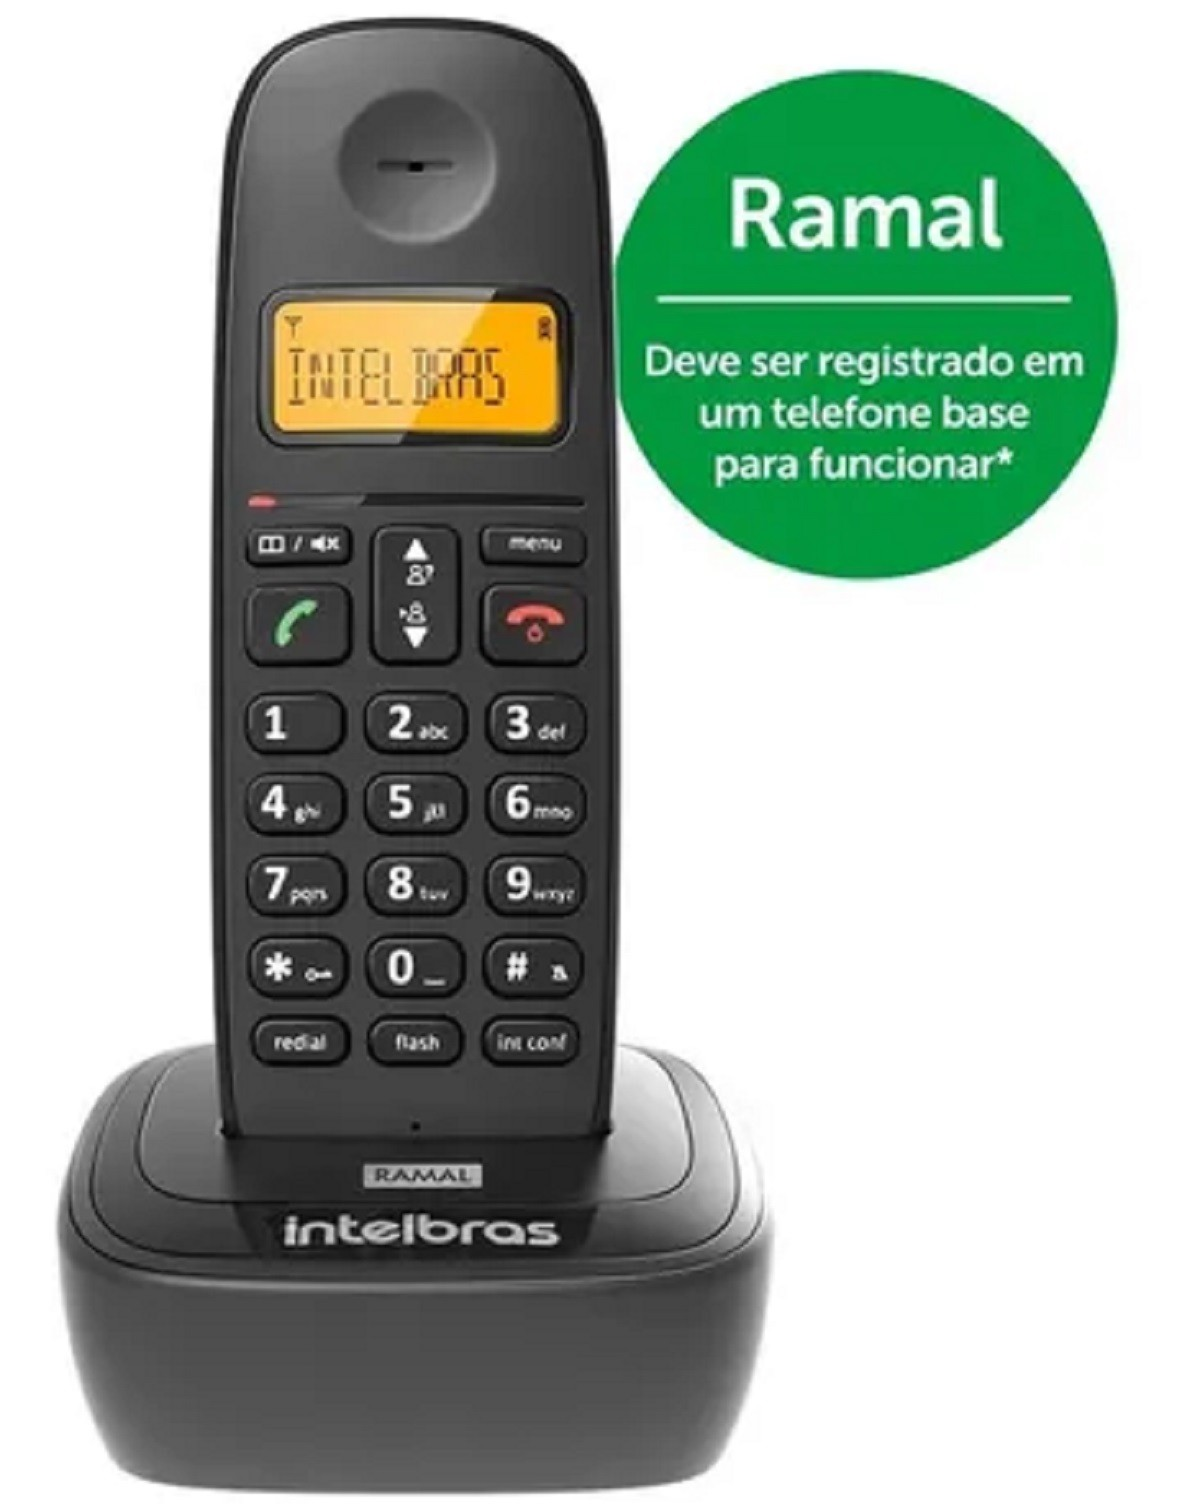 Aparelho Telefone Sem Fio Intelbras Digital Ramal TS2511